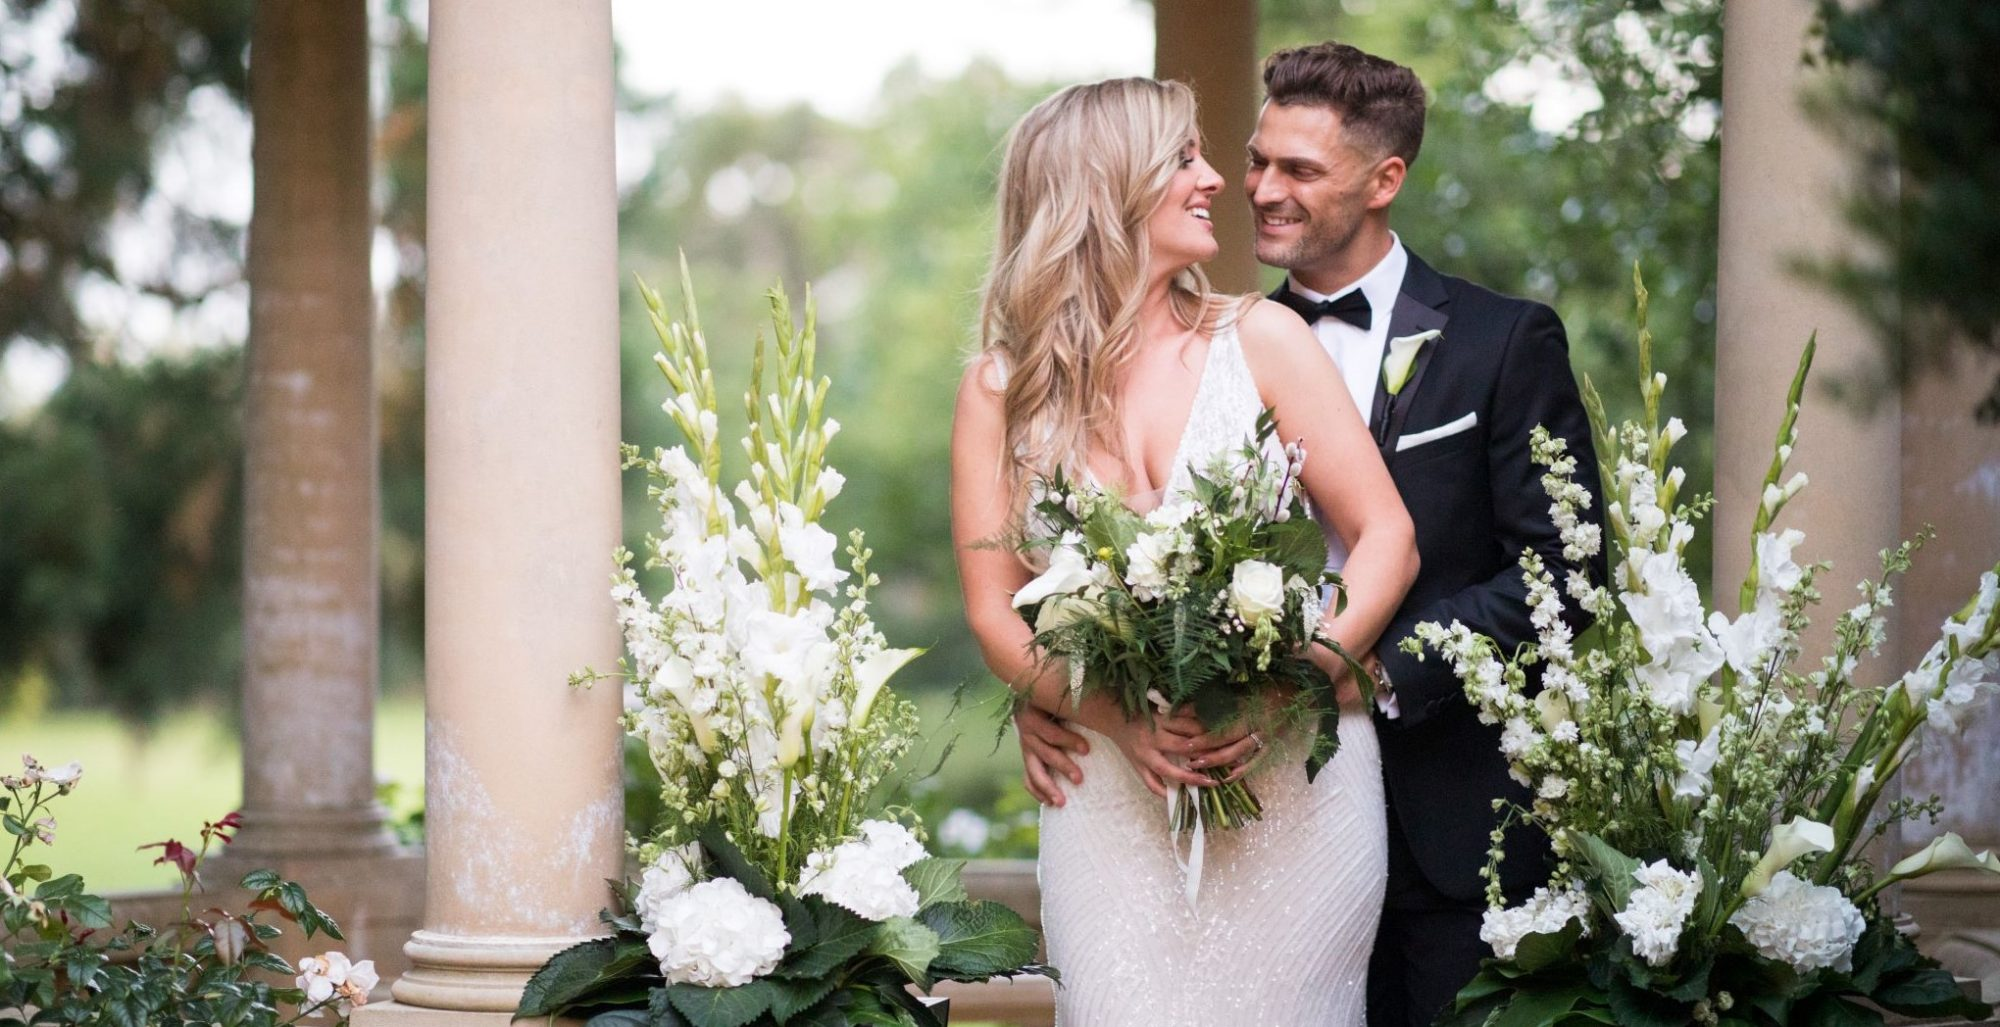 125 smiling bride groom floral arrangements kilworth house hotel gardens north kilworth leicestershire oxford wedding photographers